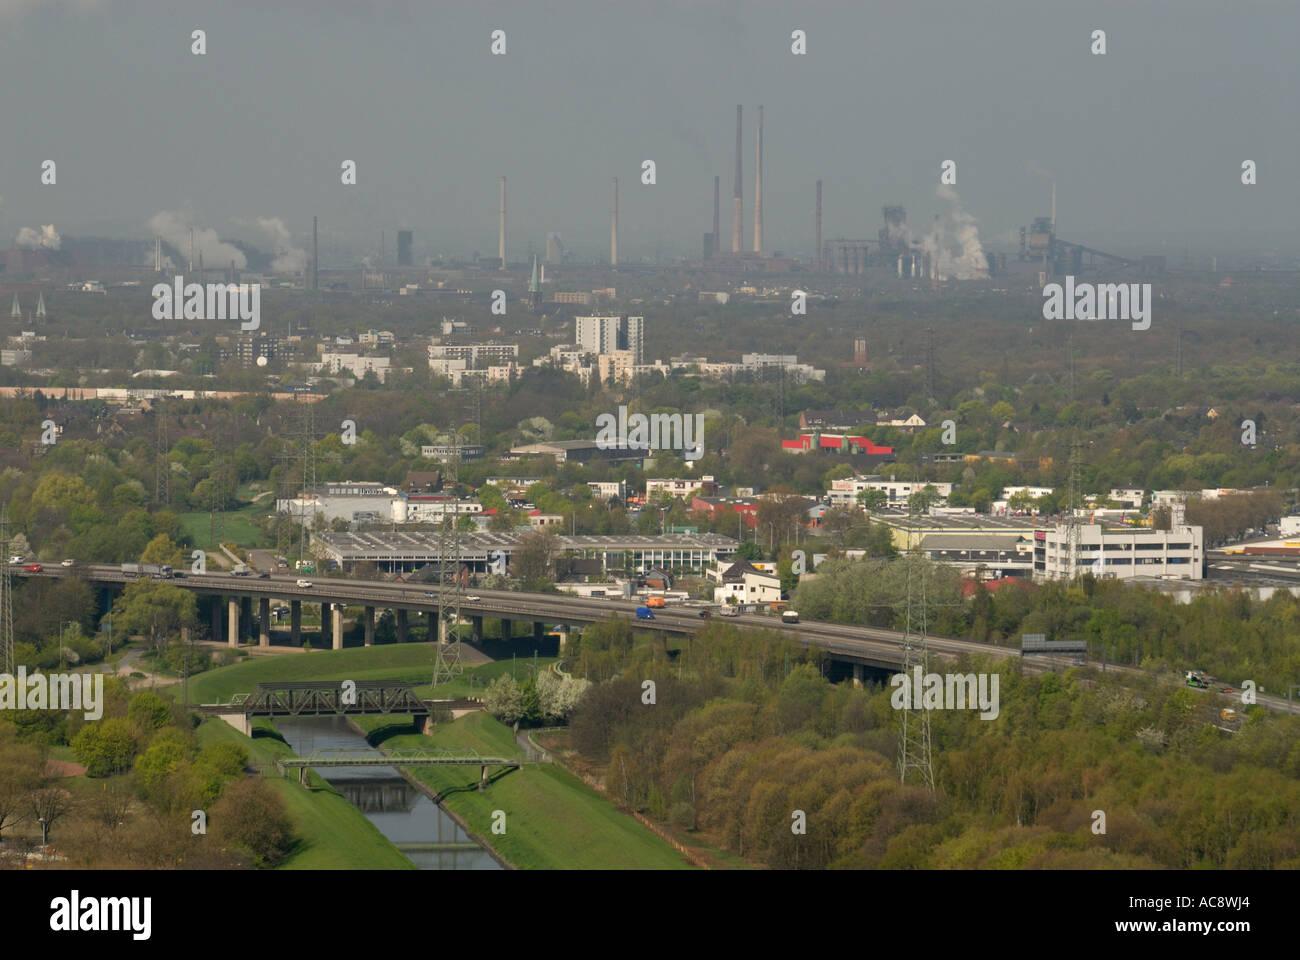 Industrial Ruhr Region at Oberhausen - Stock Image